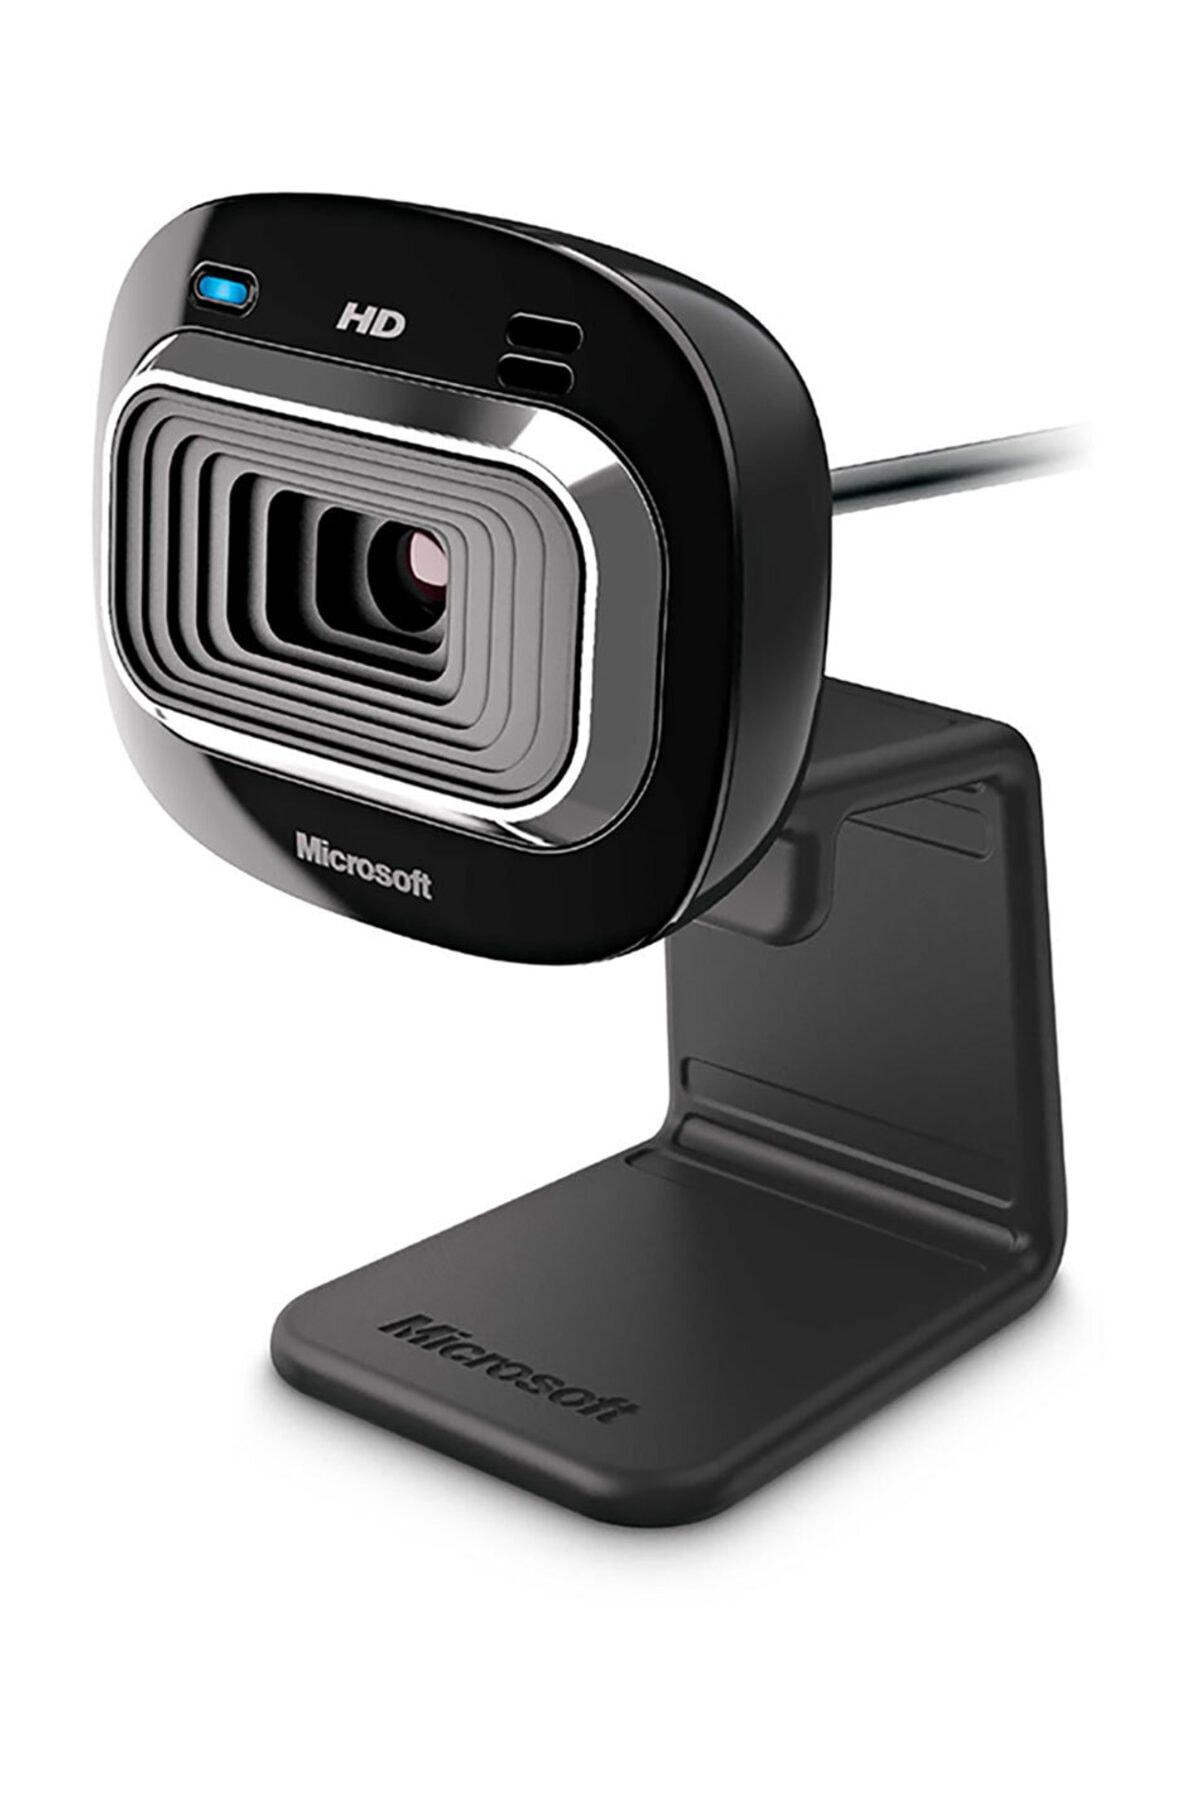 MICROSOFT Lifecam Hd-3000 720p Webcam (T4h-00004) 1